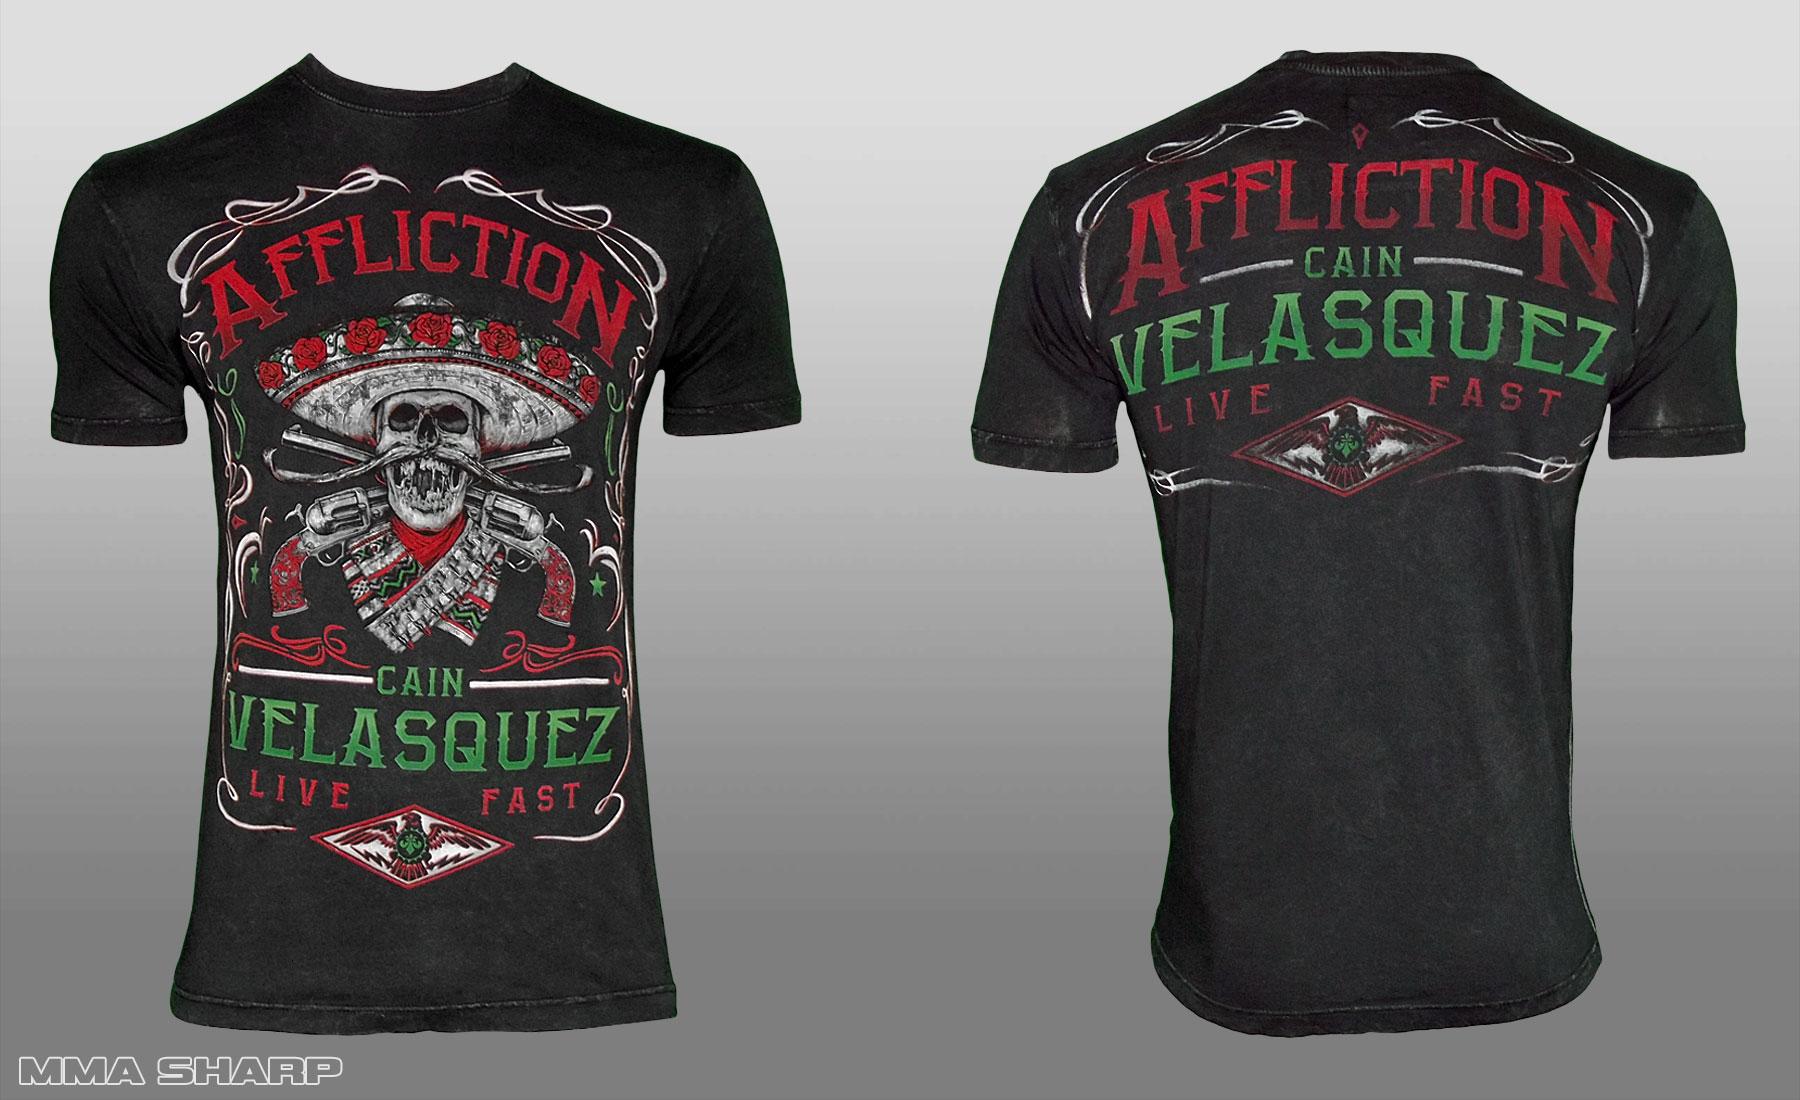 Футболка мужская MMA 193 Affliction Youth Cain Velasquez Caudillo UFC 188 Shirt футболка мужская mma a3 ufc venum team shogun tap out